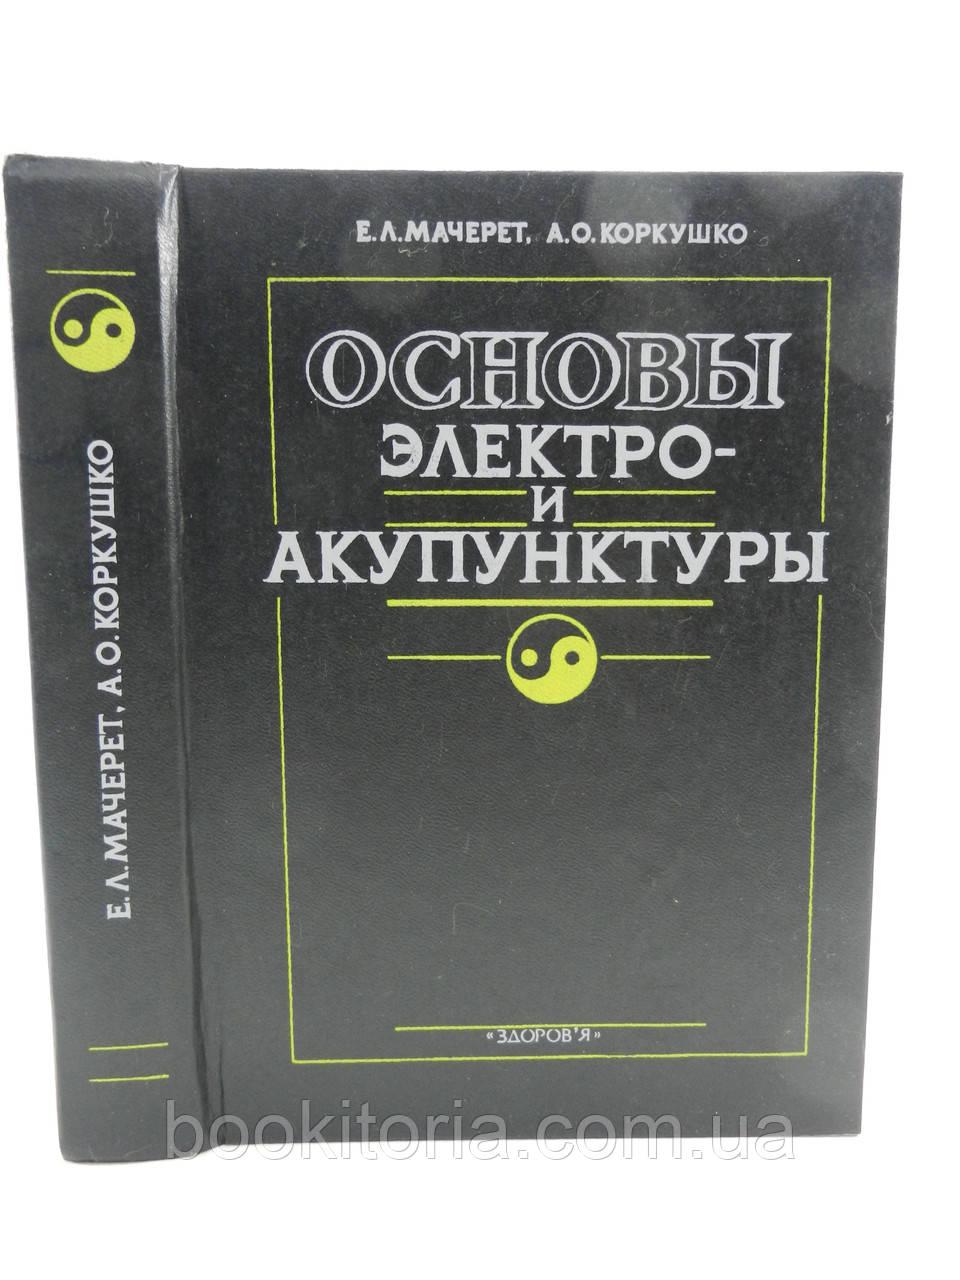 Мачерет Е., Коркушко А. Основы электро- и акупунктуры (б/у).